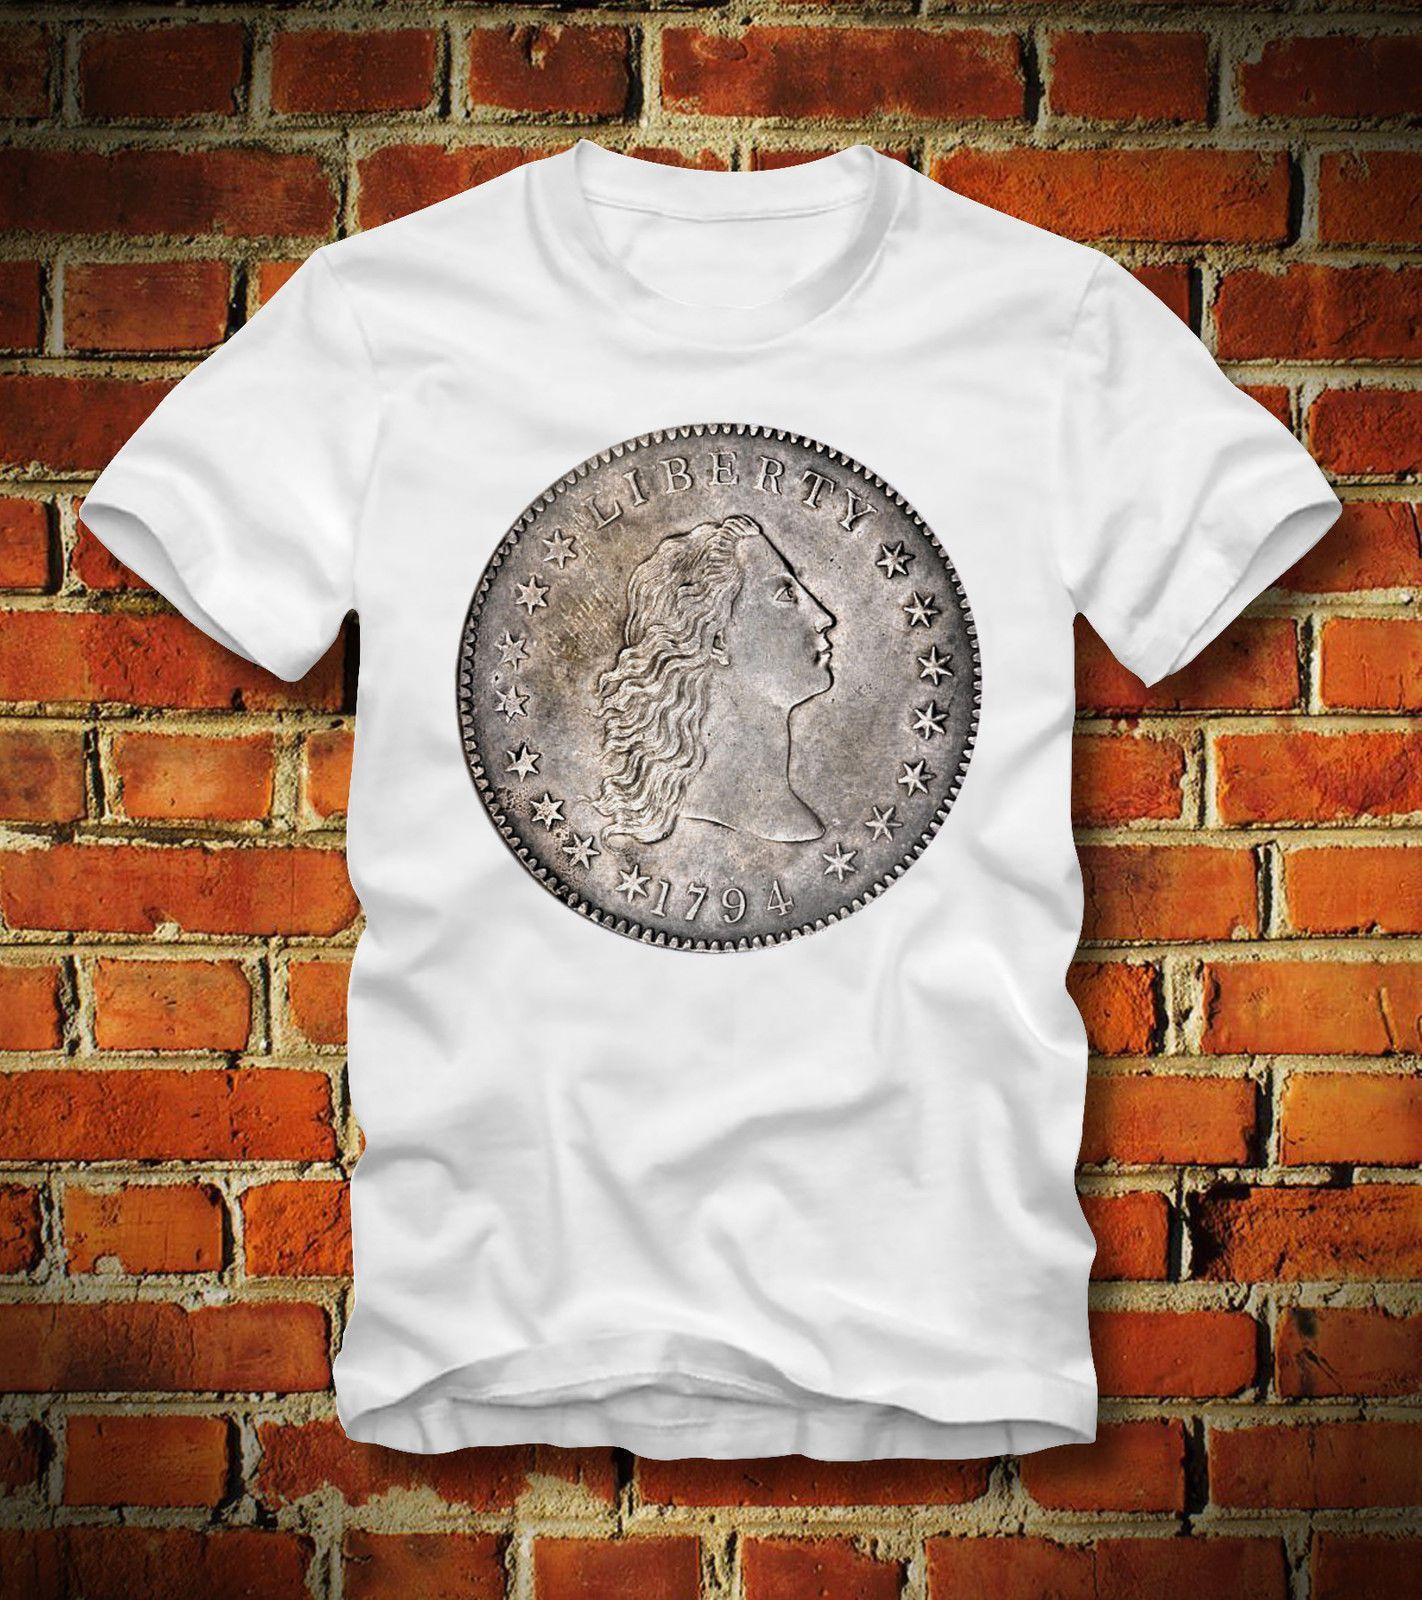 ea6673b997f BOARDRIPPAZ T SHIRT FLOWING HAIR DOLLAR COIN 1794 1795 MNZE SILVER  NUMISMATIK Mens 2018 fashion Brand T Shirt O-Neck